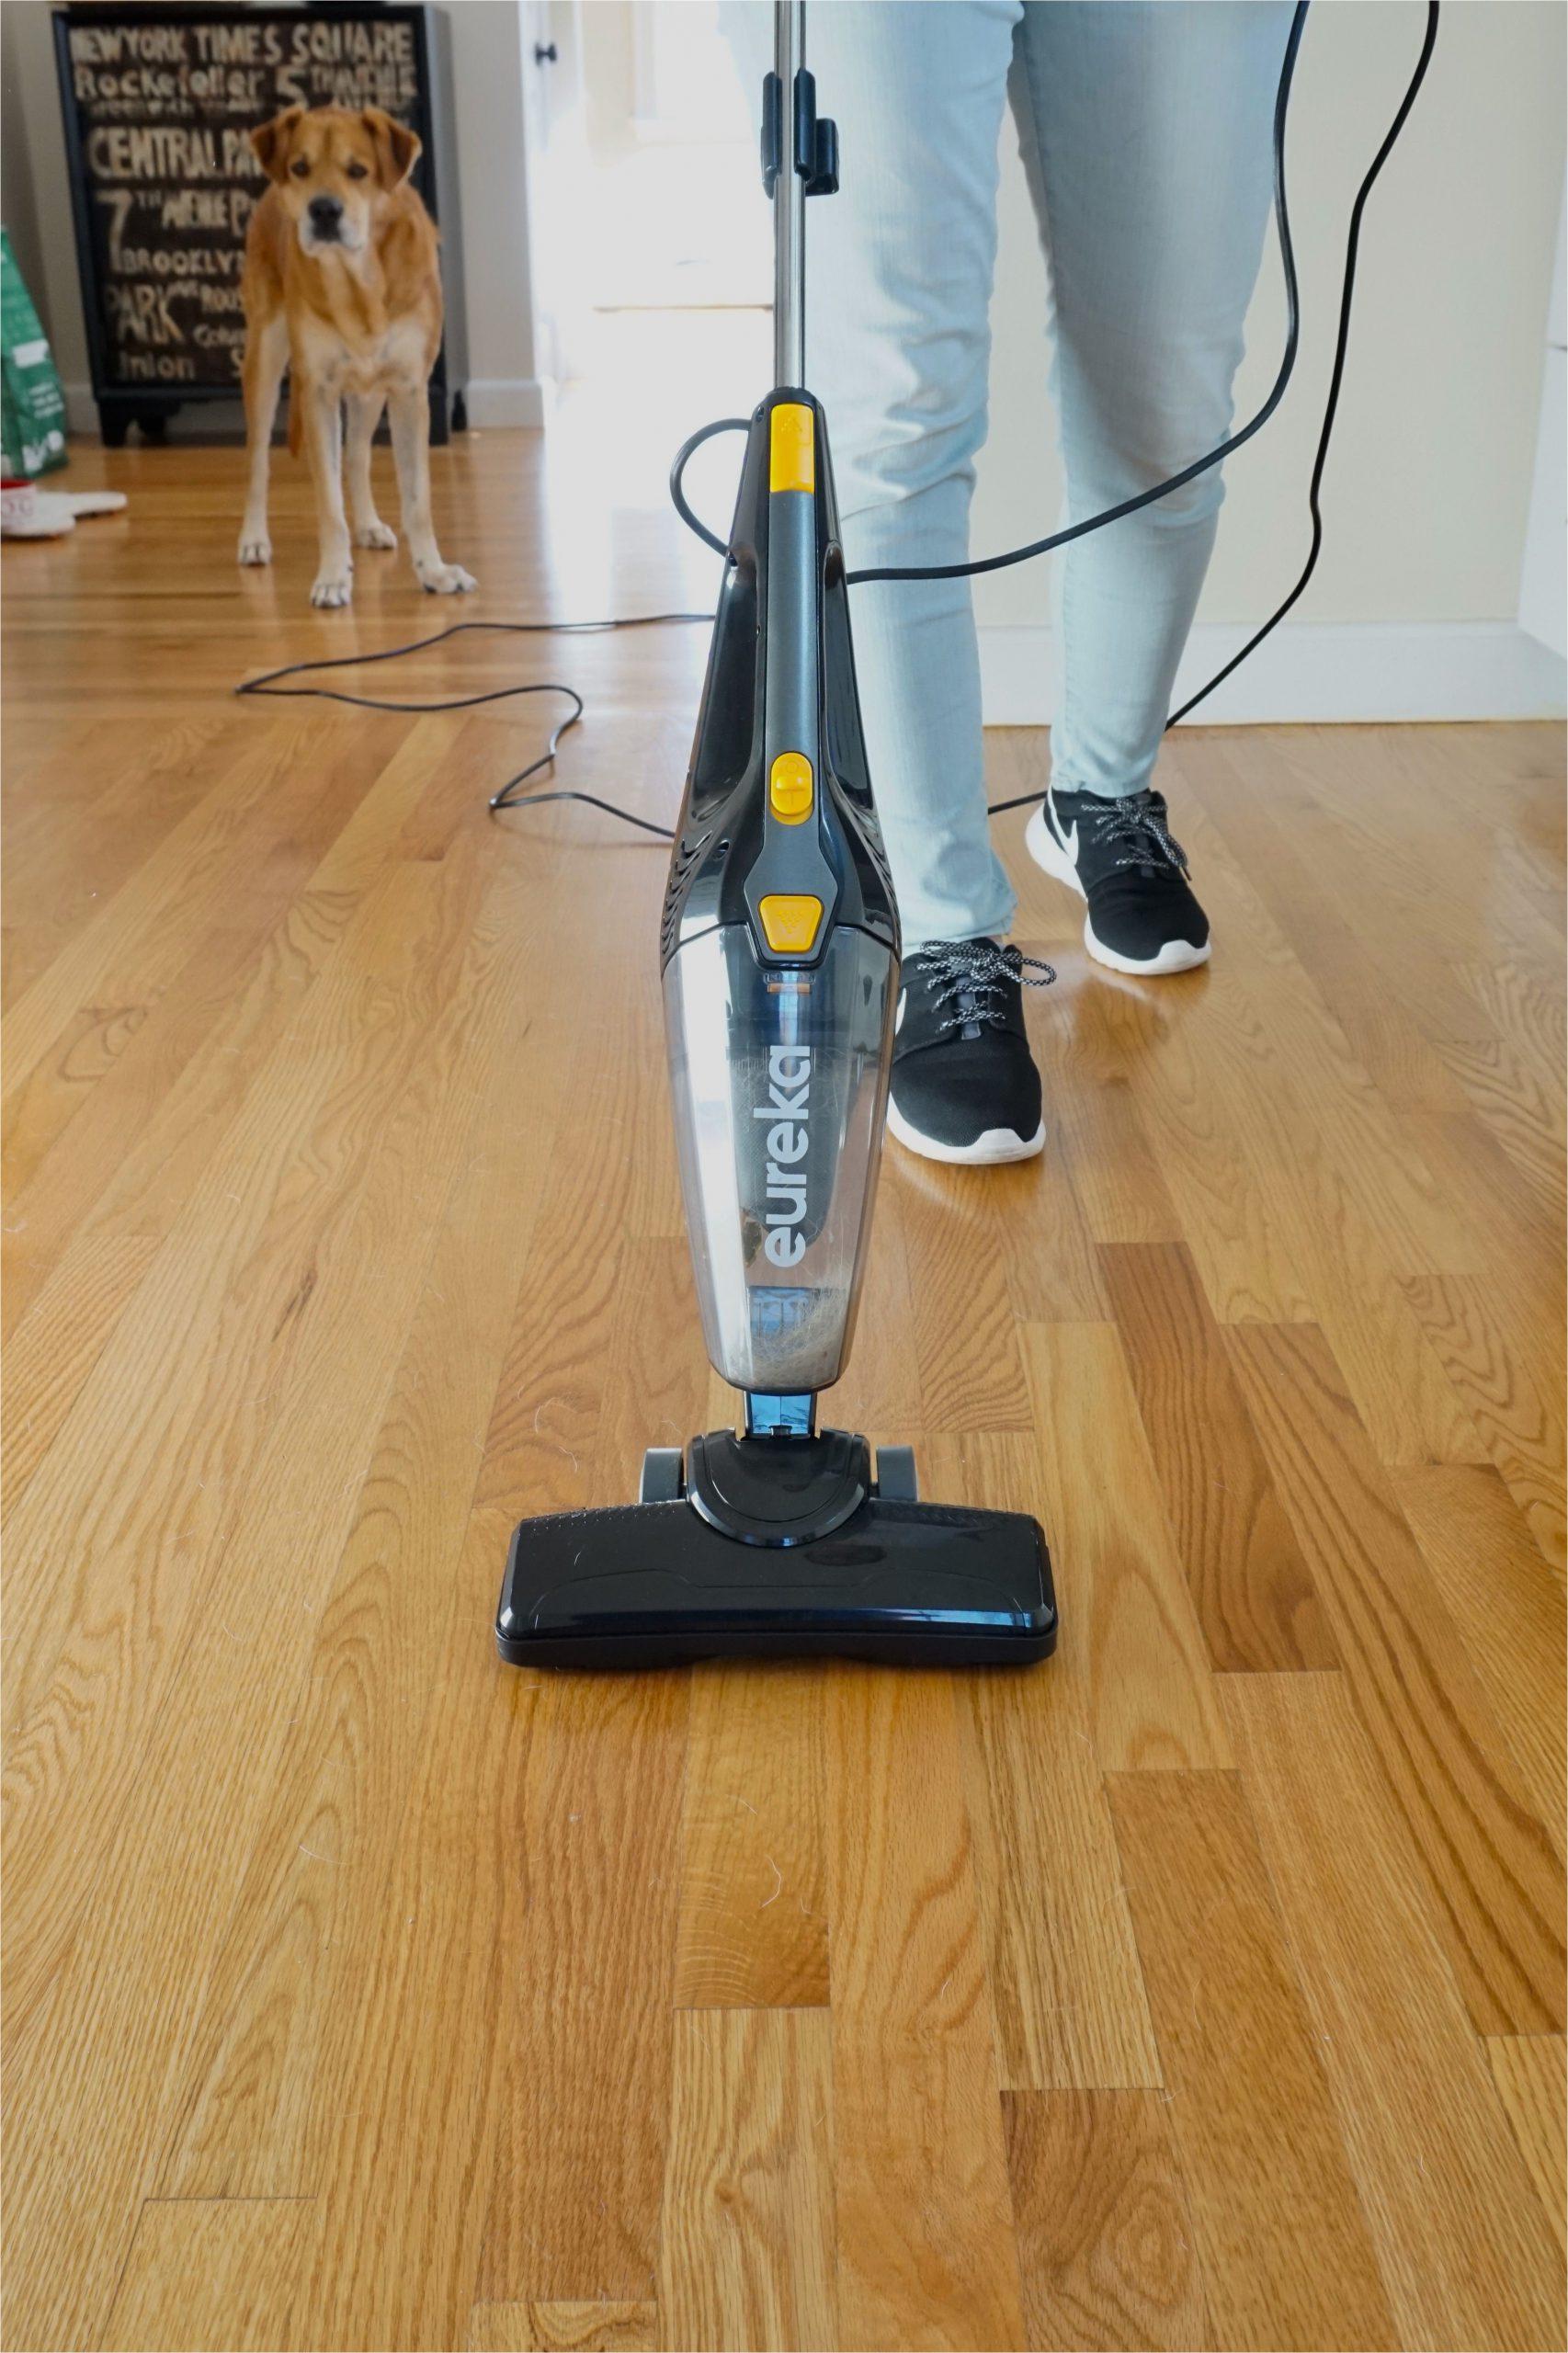 Best Upright Vacuum for Hardwood Floors and area Rugs Eureka Blaze 3 In 1 Swivel Lightweight Stick Vacuum Review